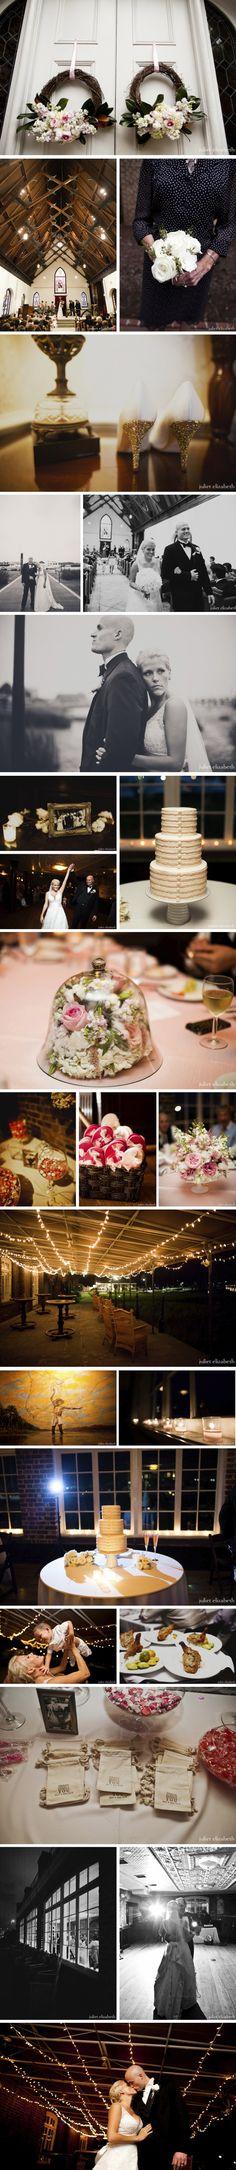 Historic Rice Mill Wedding | Charleston Weddings | The Wedding Row | Could DIY something like this easily